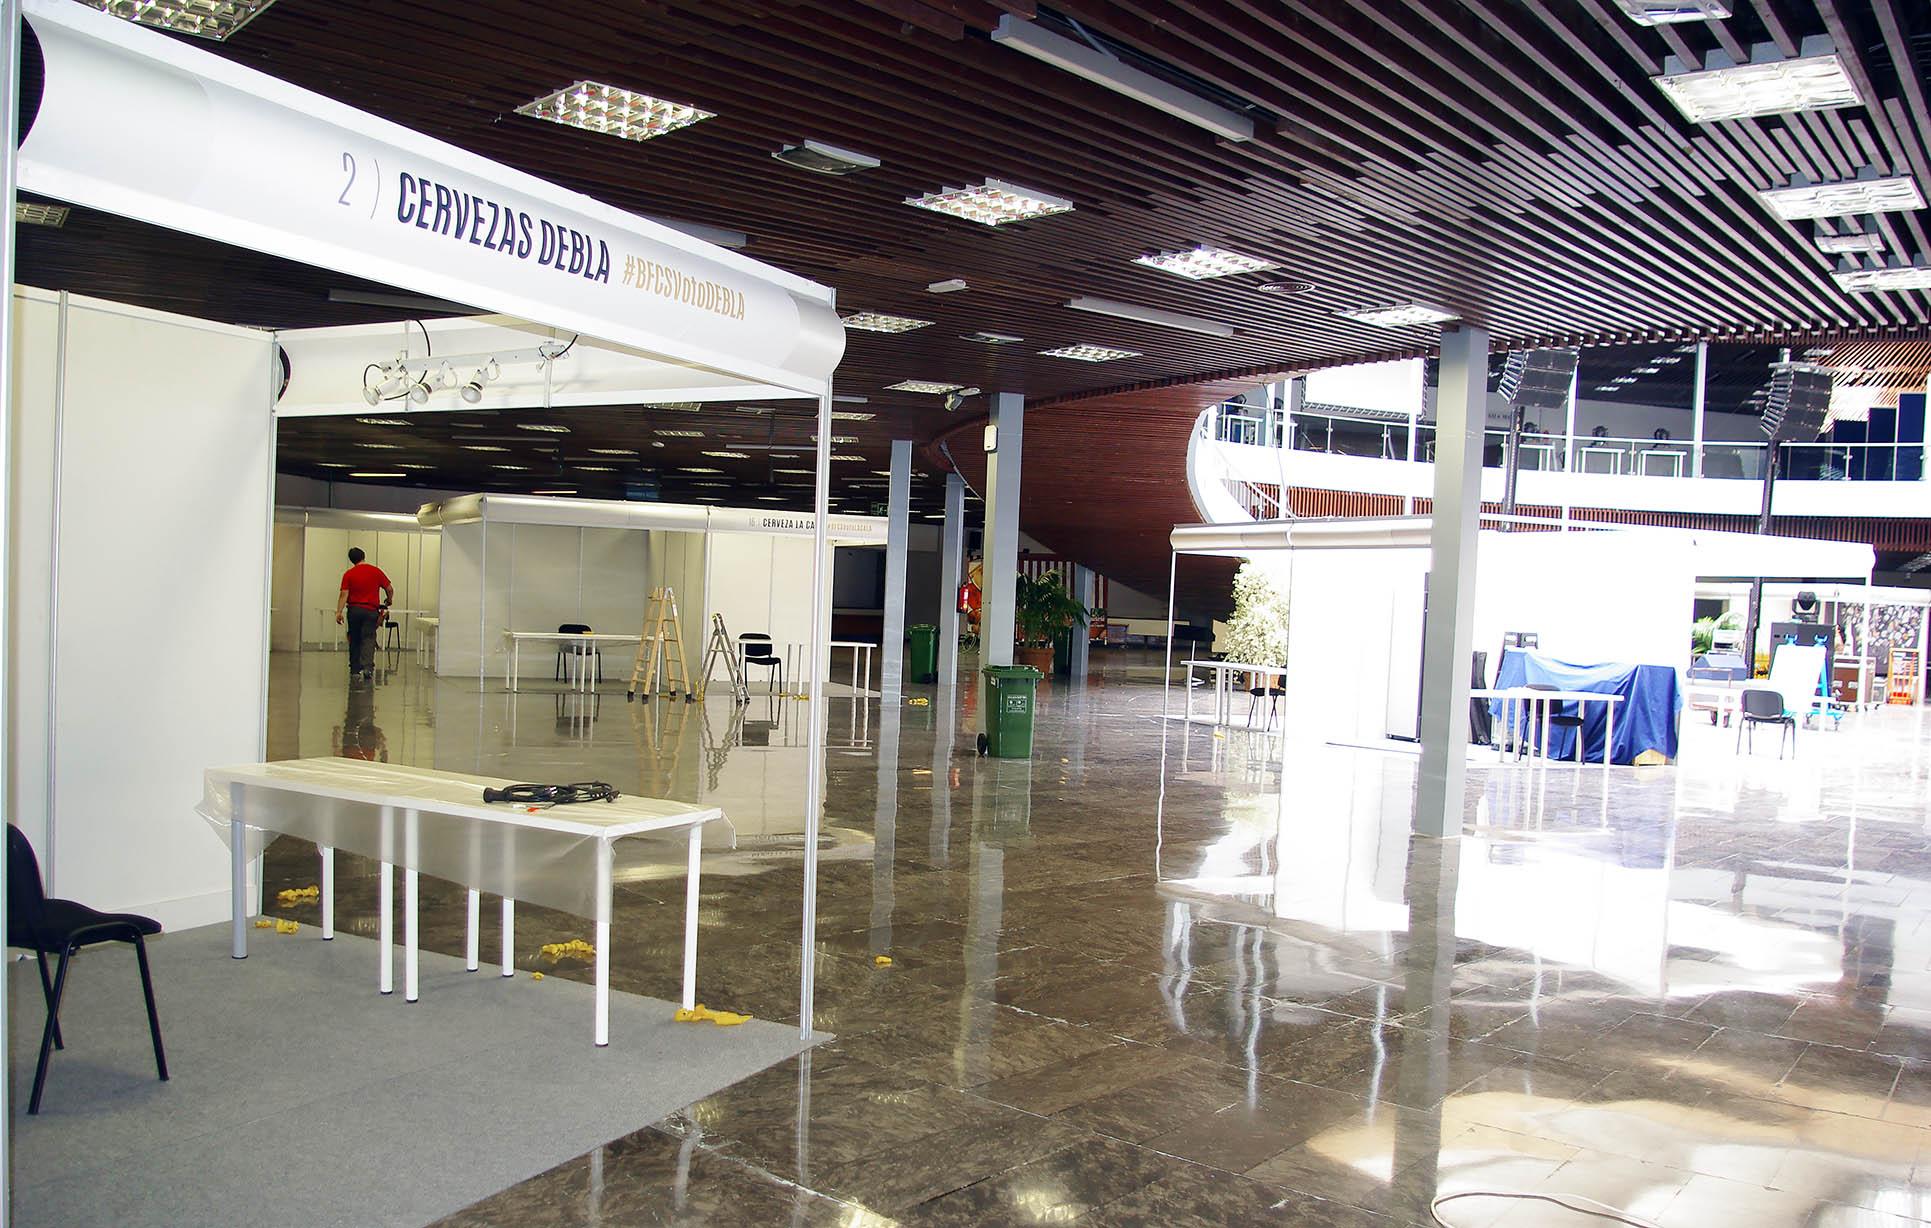 Inauguración de la BEERFEST COSTA DEL SOL 'I Feria de la Cerveza Artesana' 2